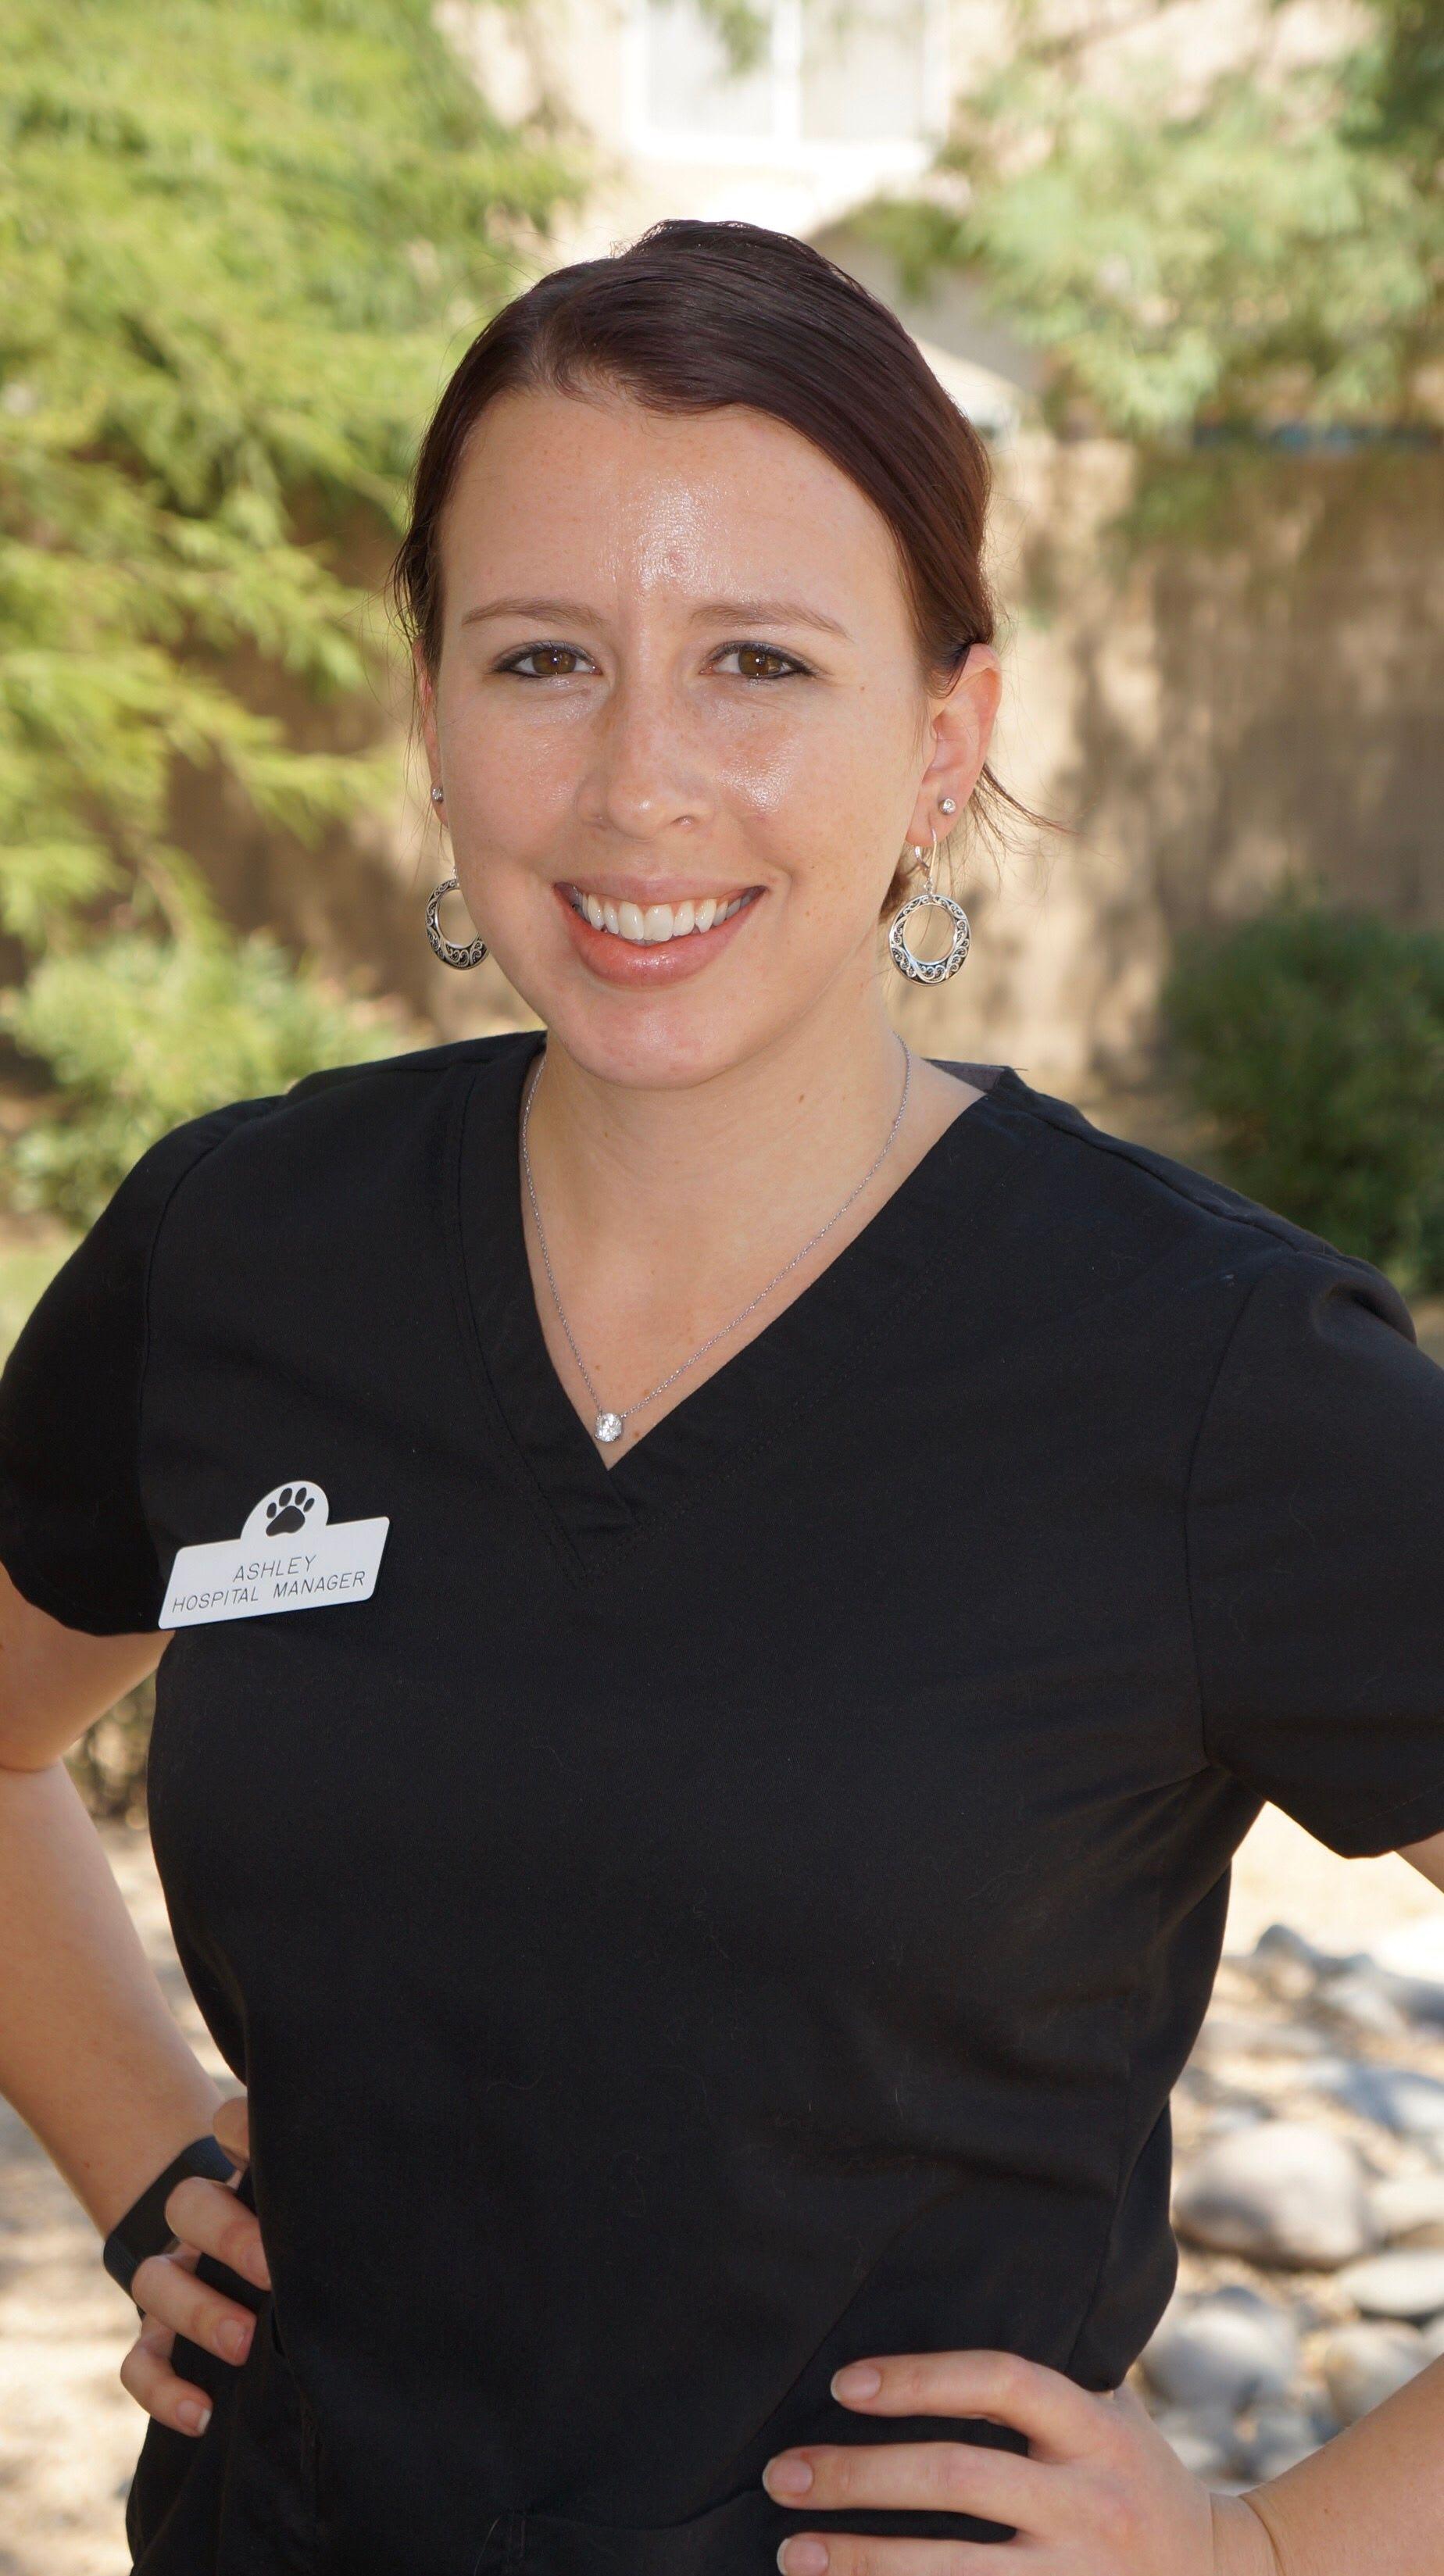 Ashley, Prestige Animal Clinic manager